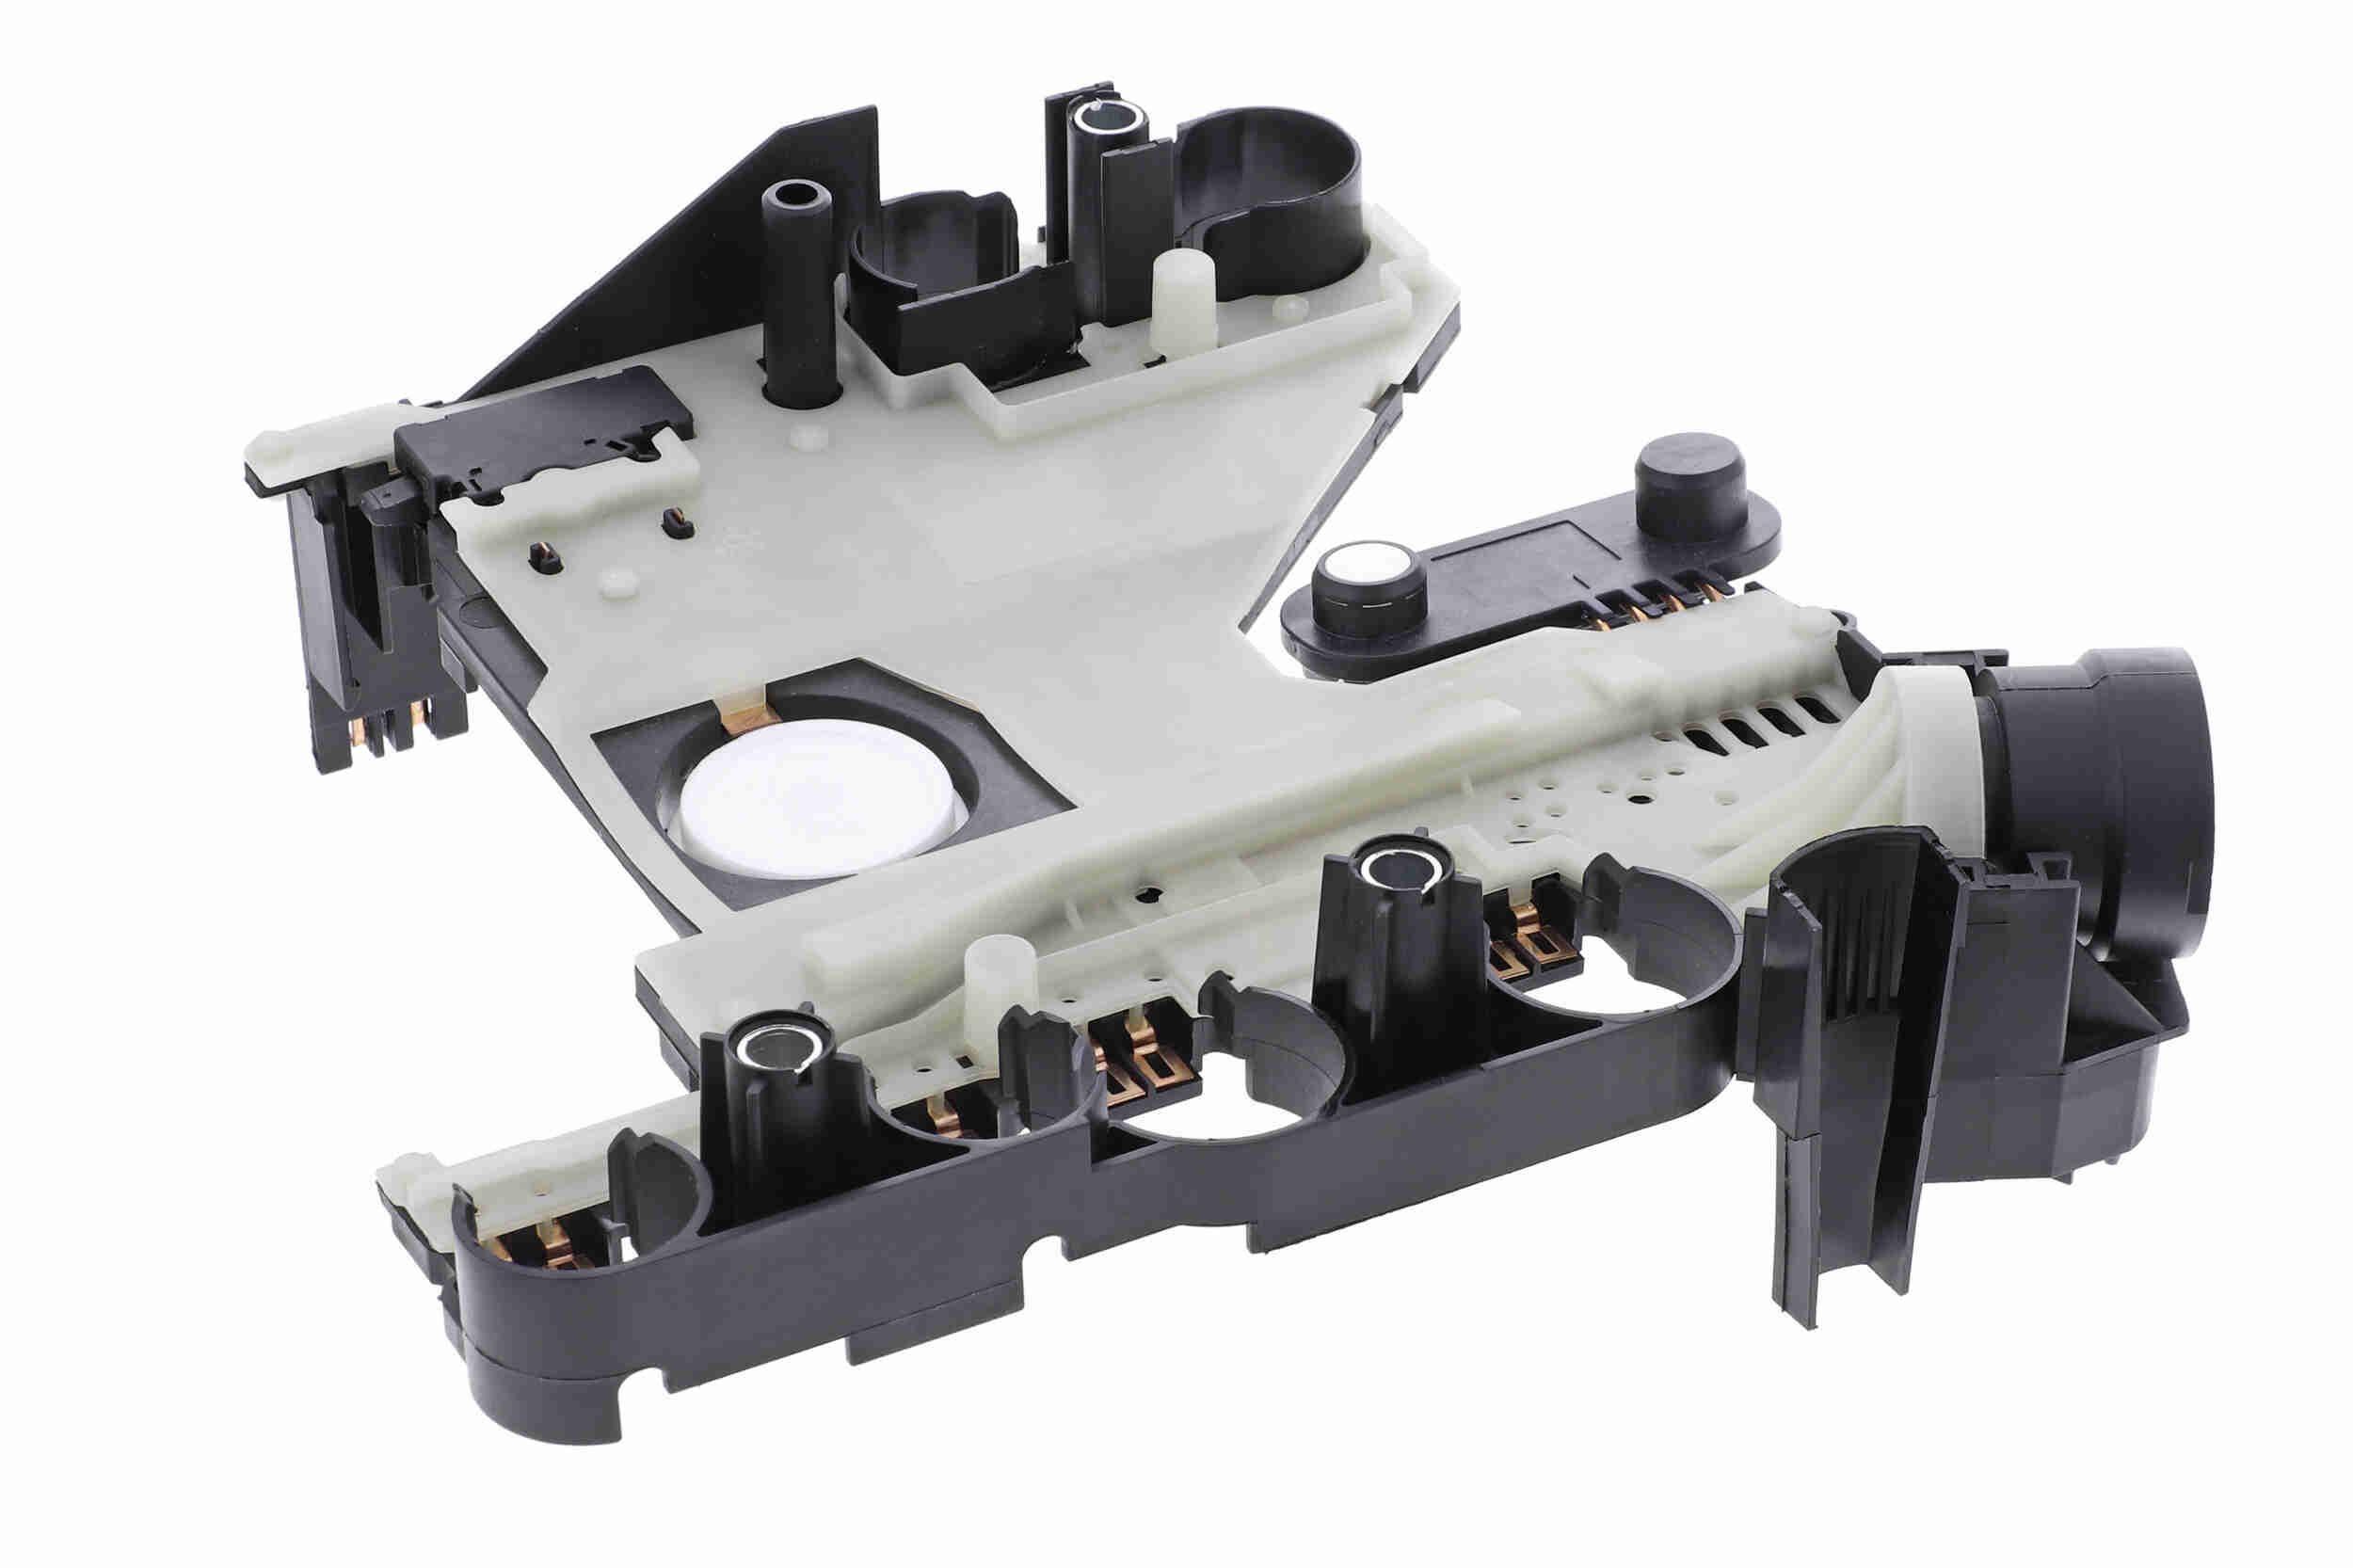 Original OPEL Automatikgetriebe Steuergerät V33-86-0001